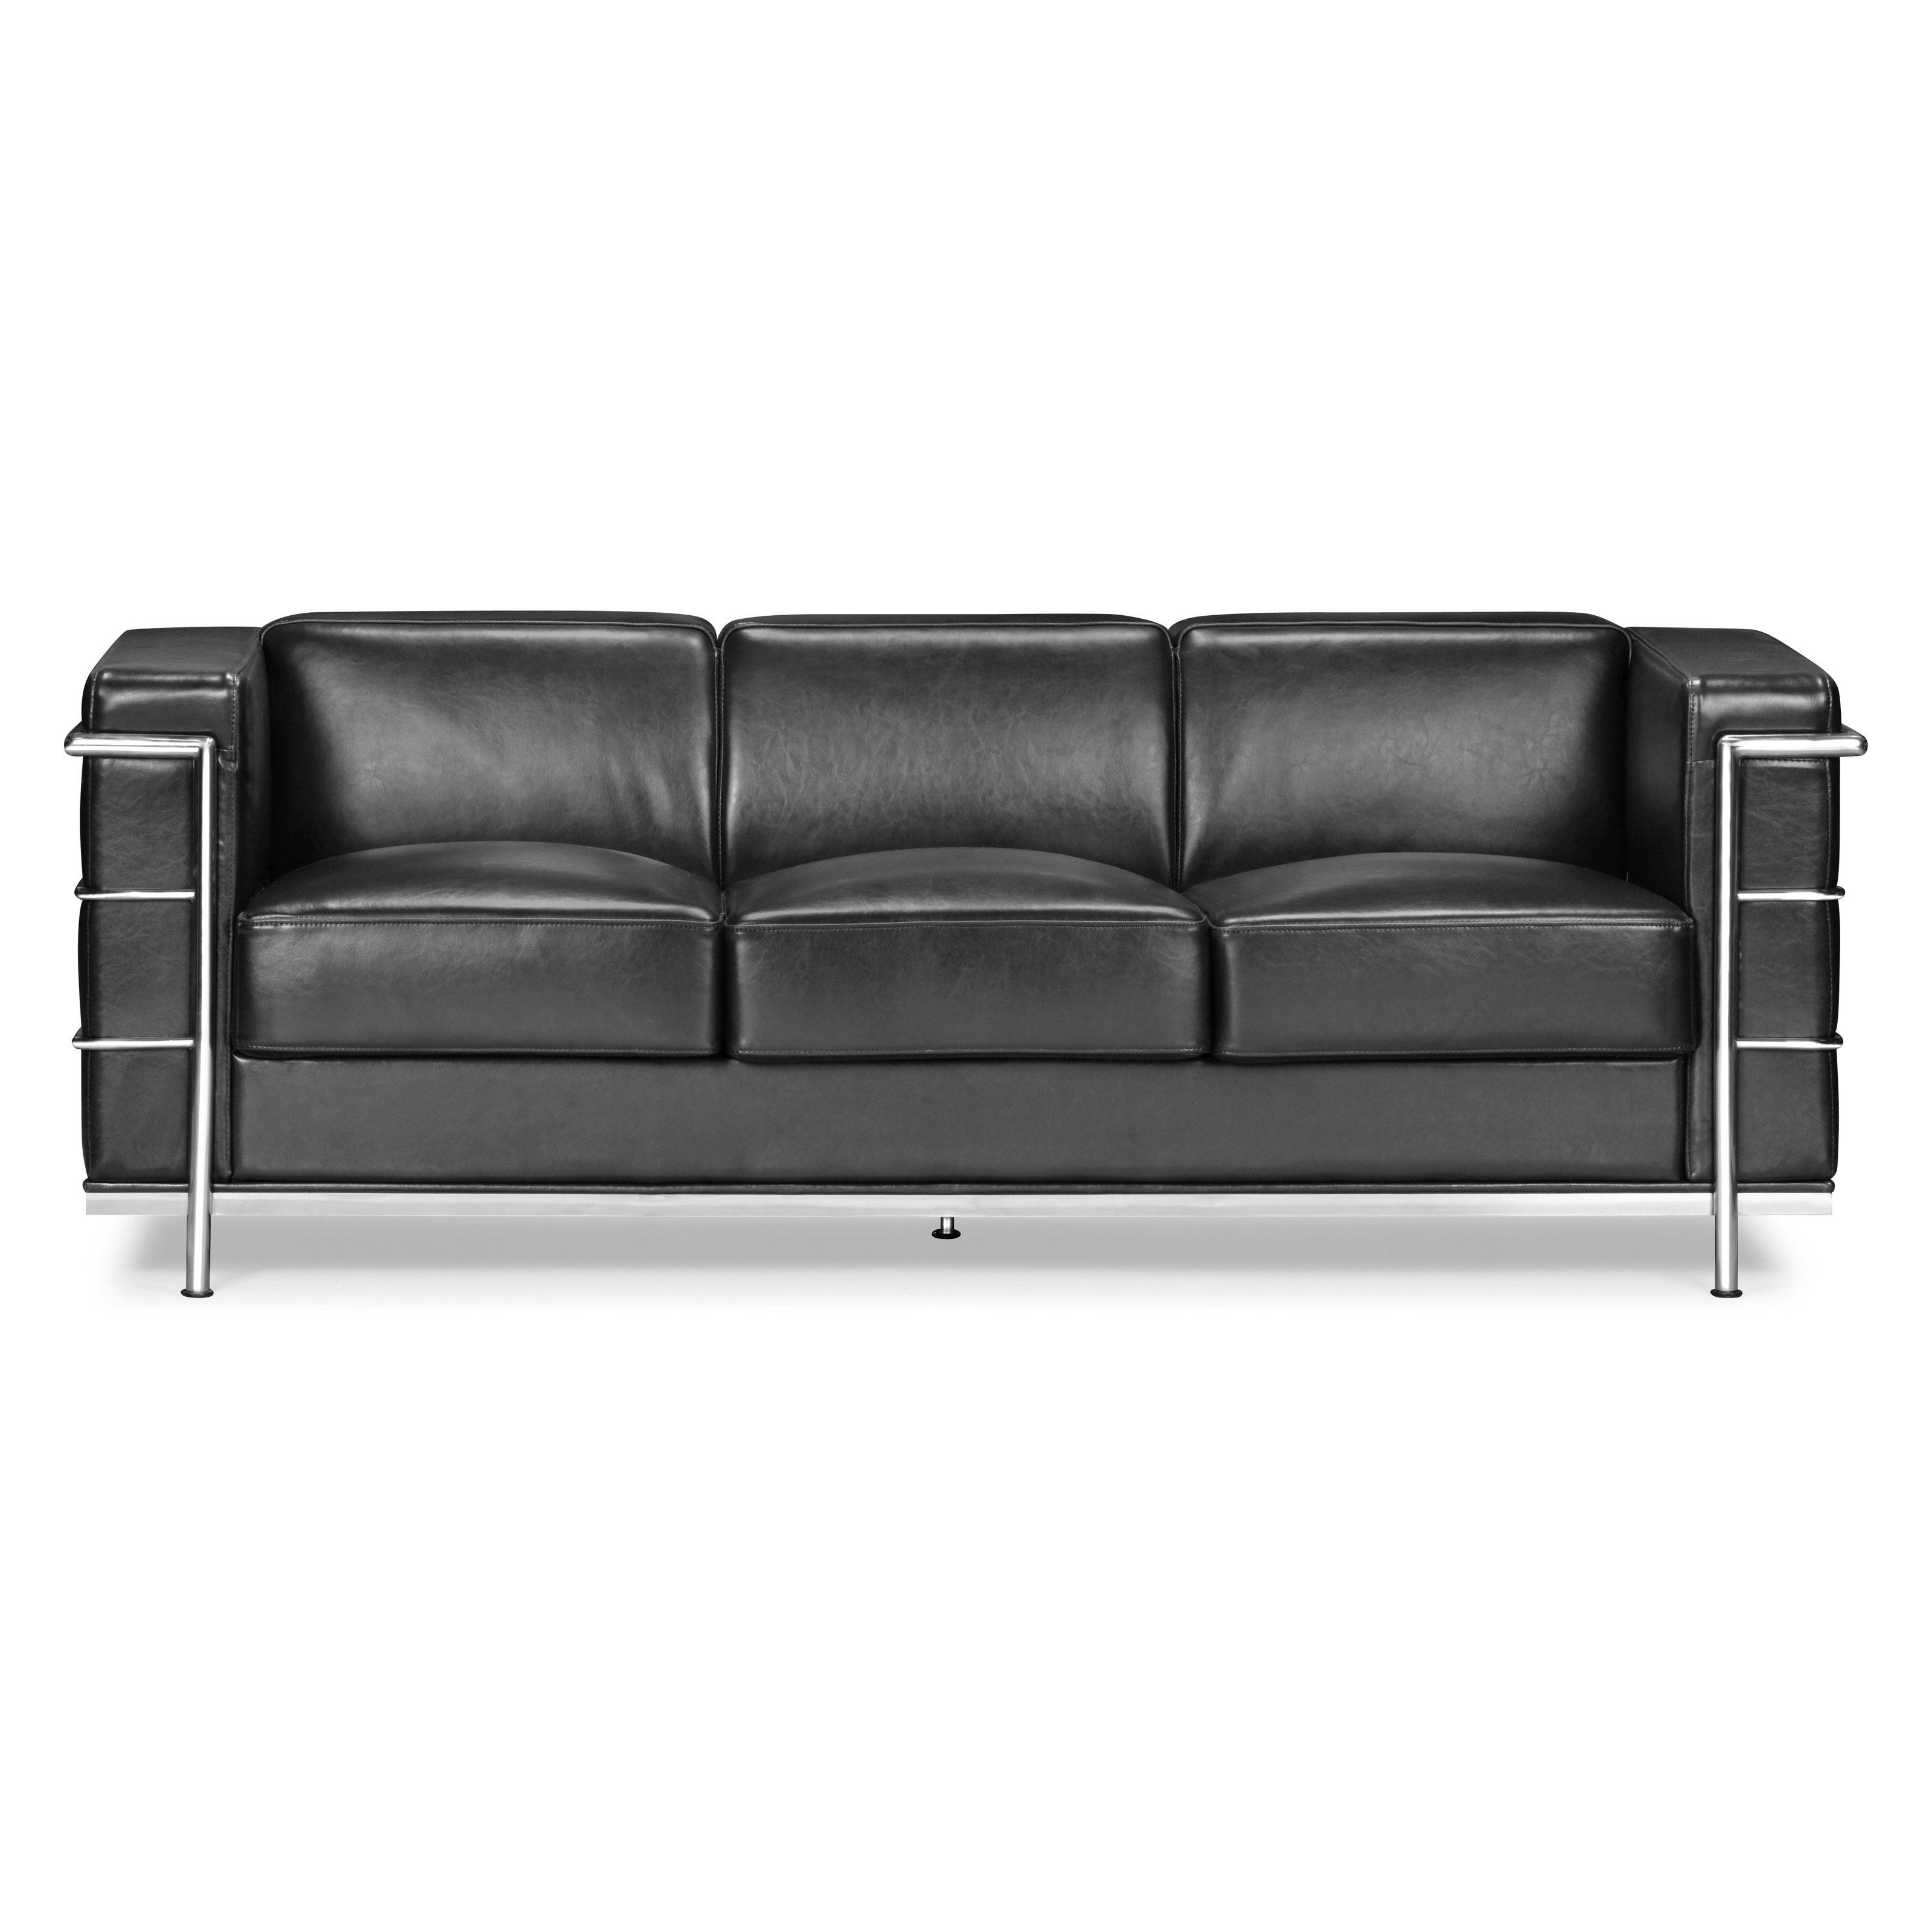 Zuo Modern Fortress Sofa   $1798 @hayneedle.com